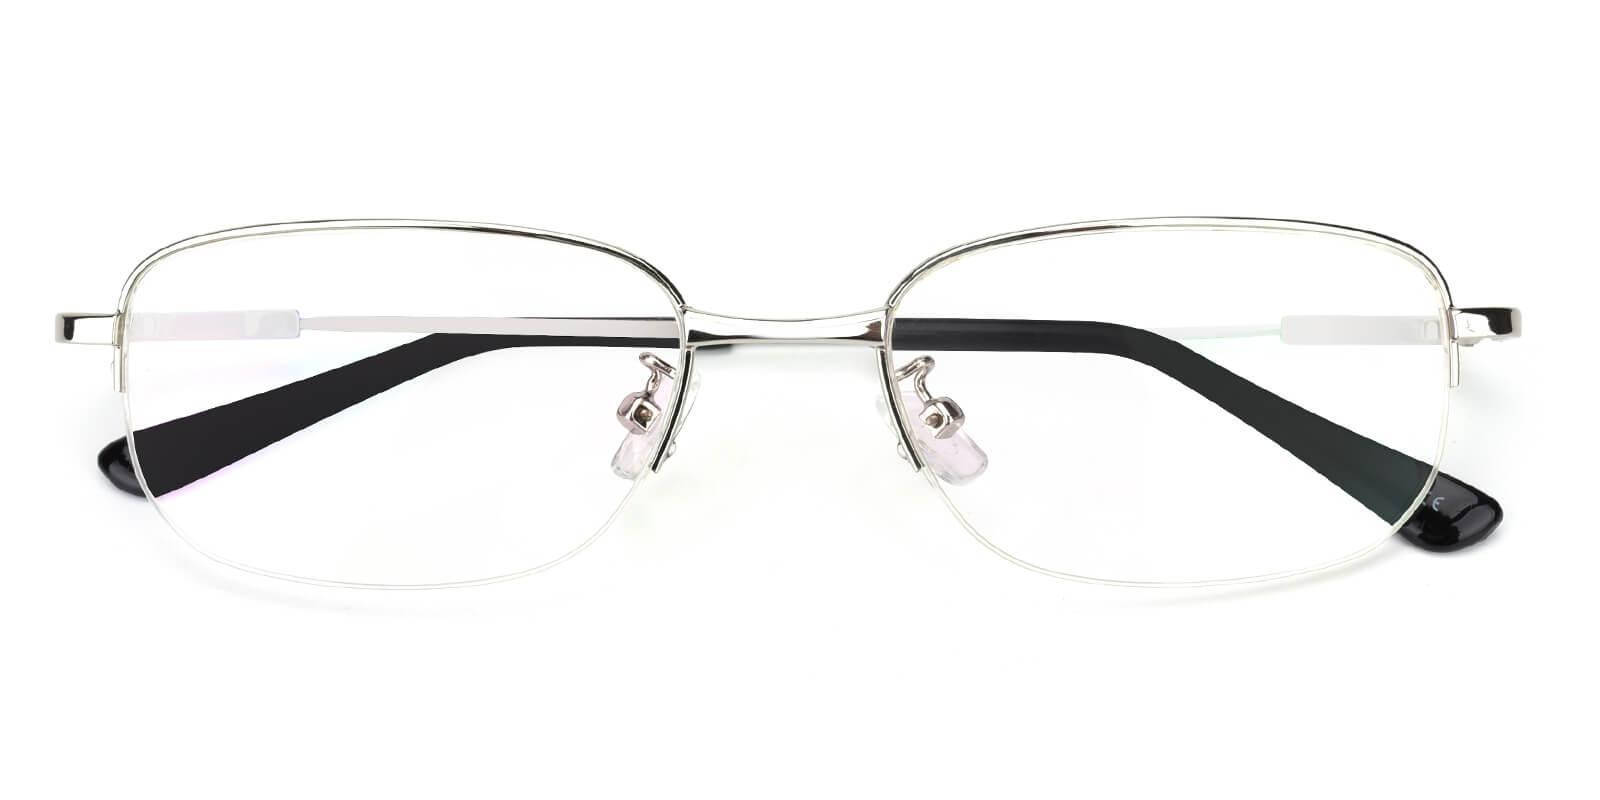 Joplin-Silver-Rectangle-Metal-Eyeglasses-detail